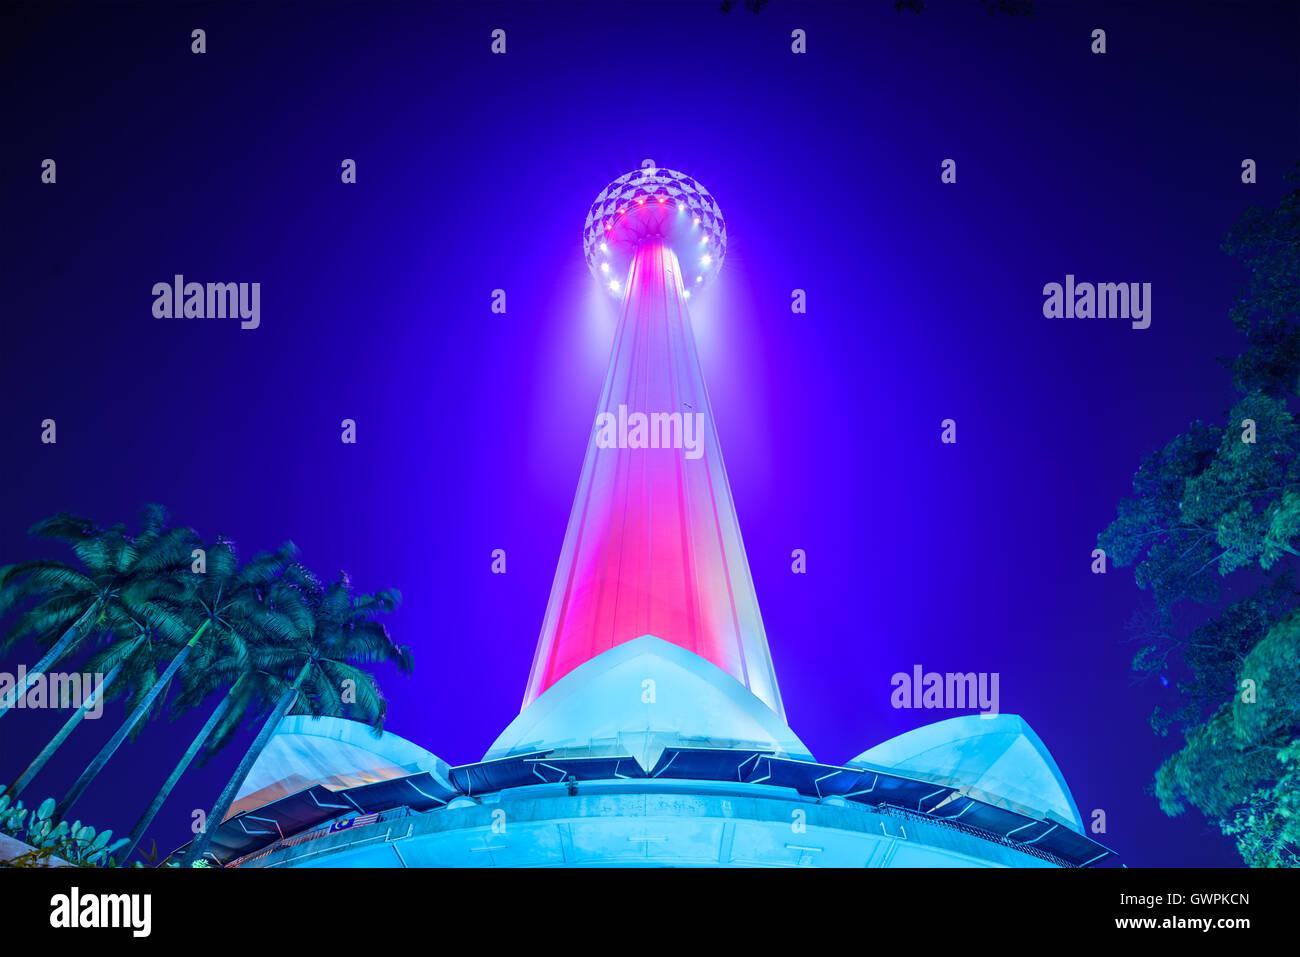 KL Menara Tower at night in Kuala Lumpur. - Stock Image